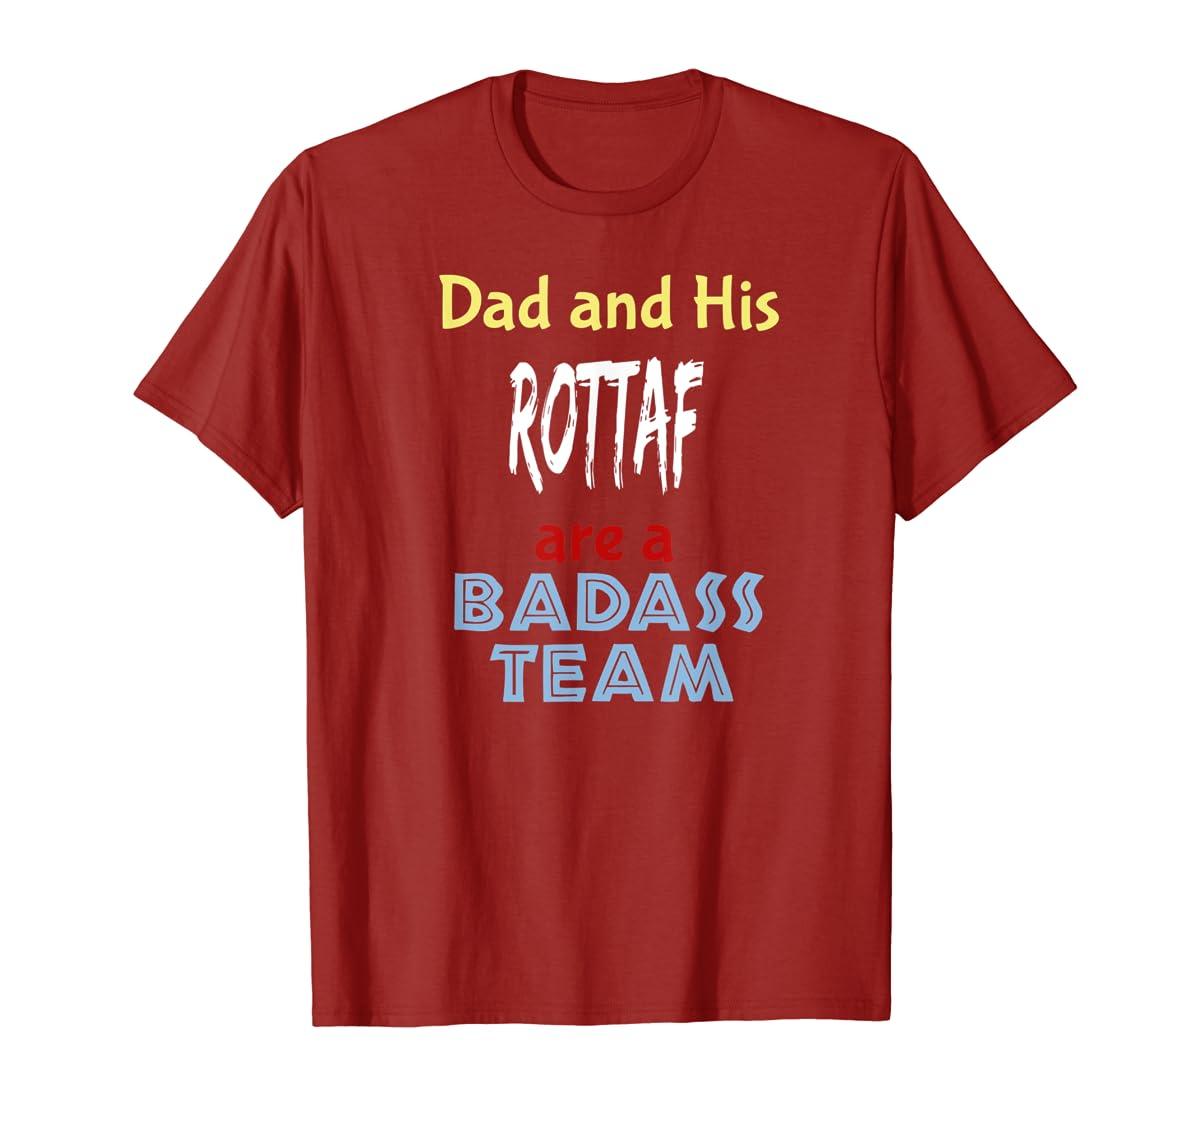 Mens Rottaf Dog Shirt Love Rottweiler + Afghan Hound =  T-Shirt-Men's T-Shirt-Red